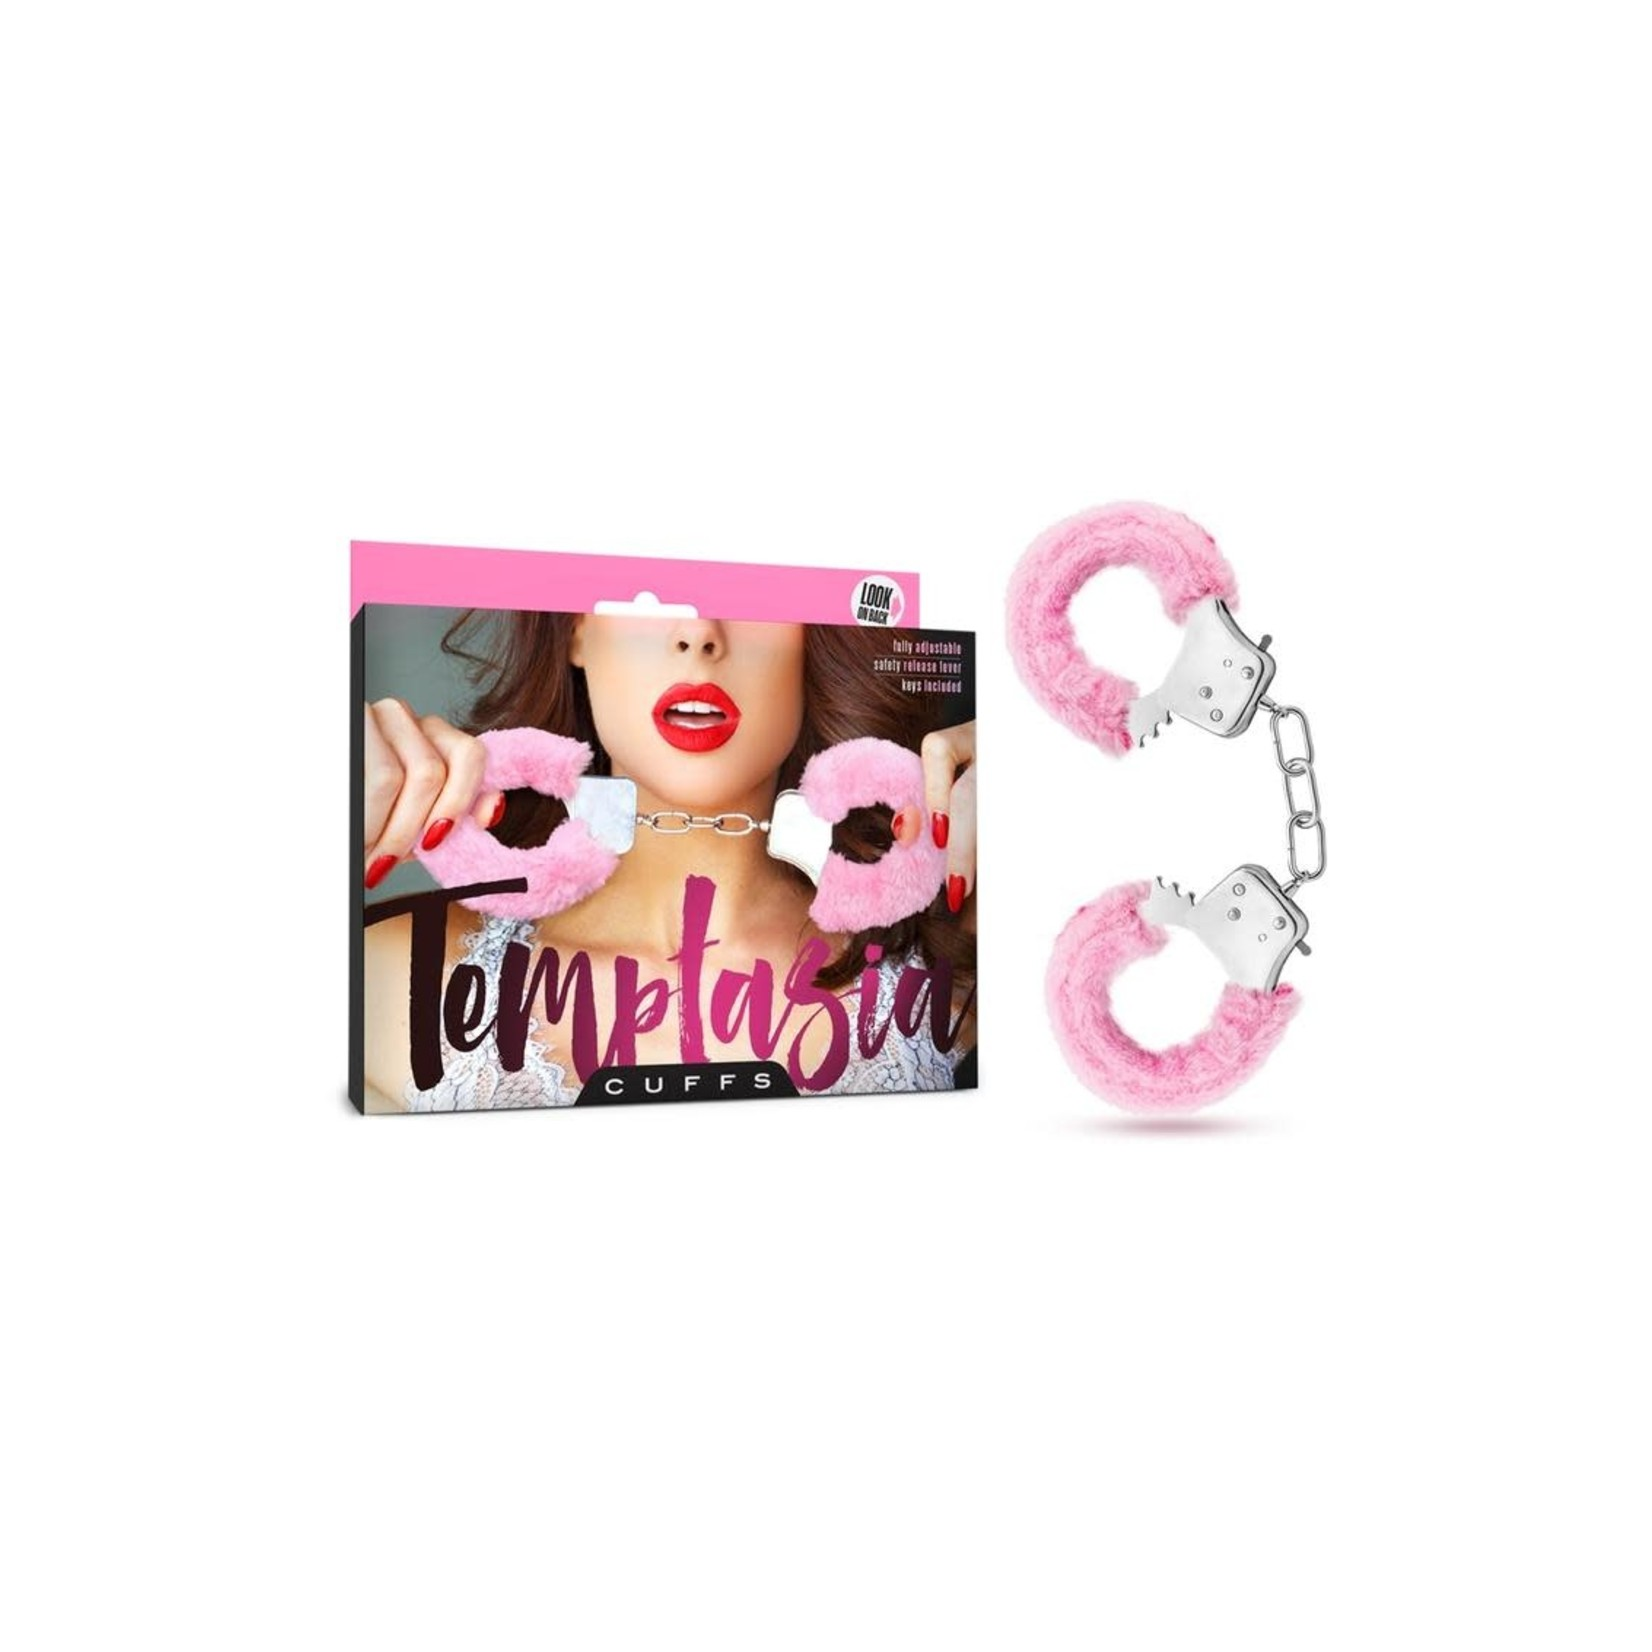 Temptasia Faux Fur Cuffs - Pink